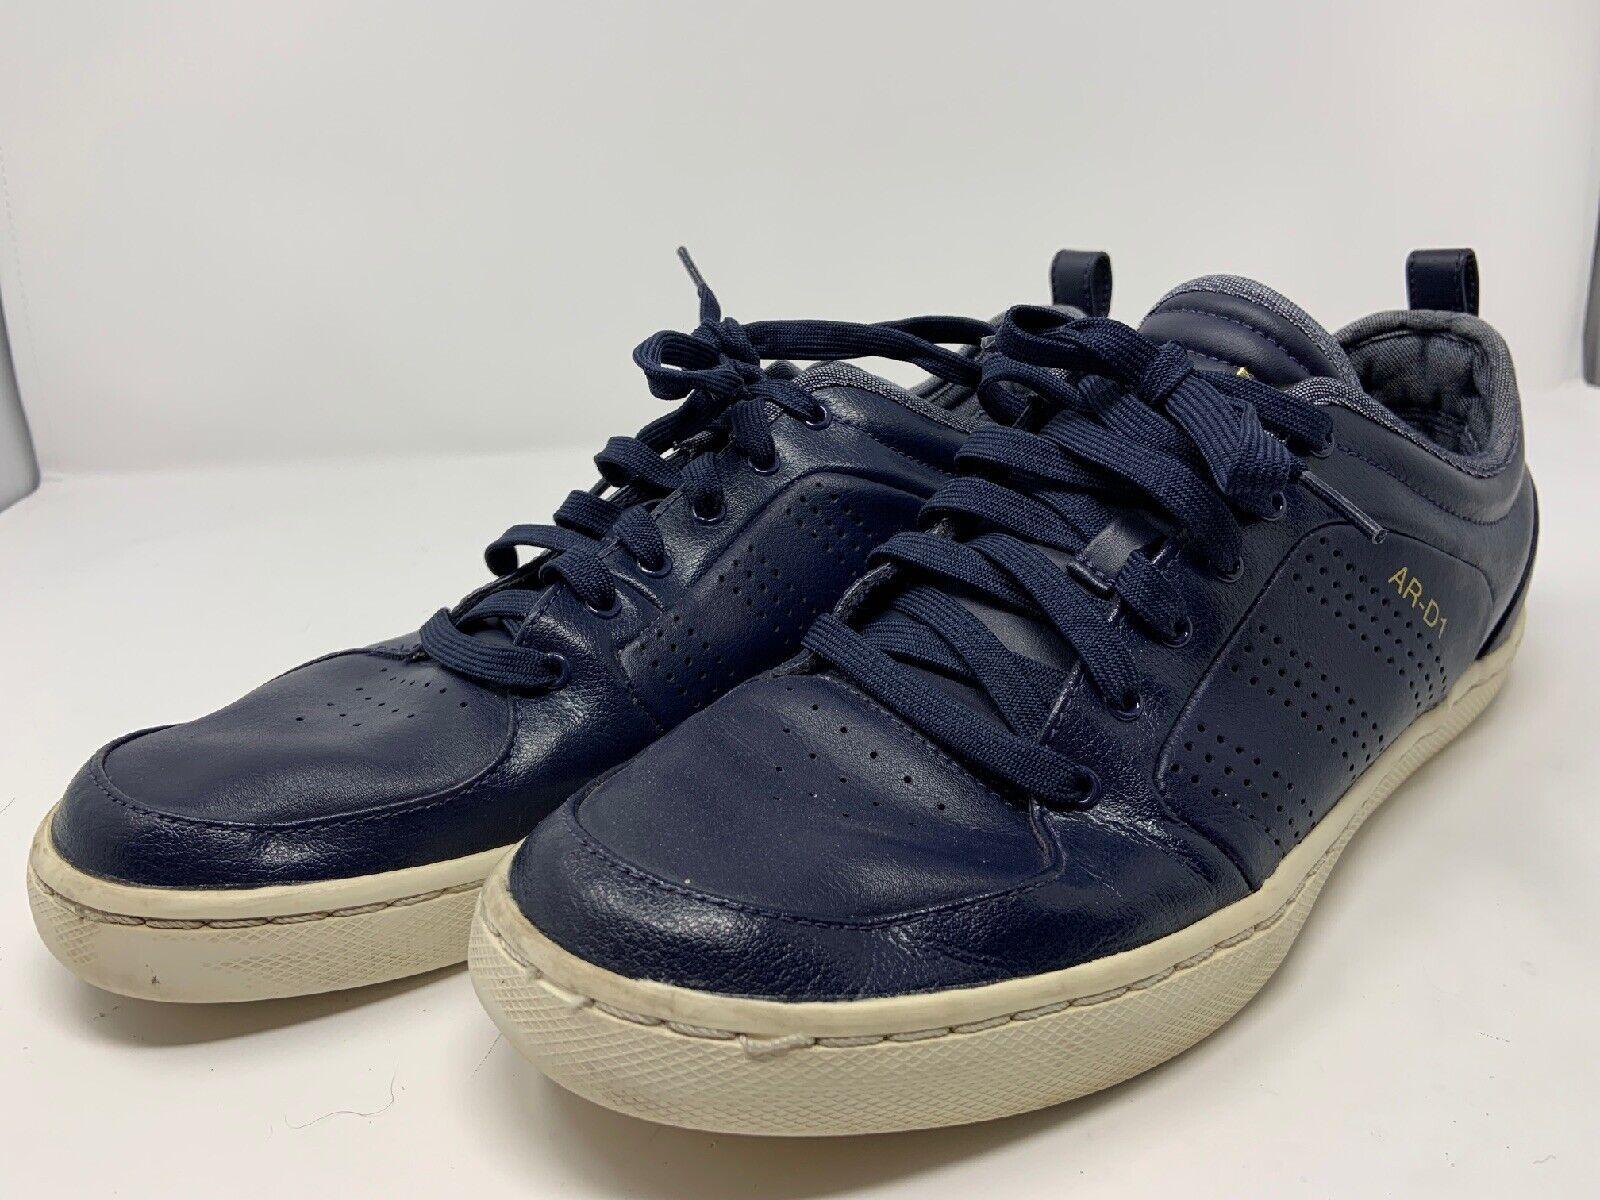 Terraplén pegar lado  adidas Originals G96041 AR 3.0 ADIRISE Shoes Sz 11 Tech Grey Blue for sale  online | eBay